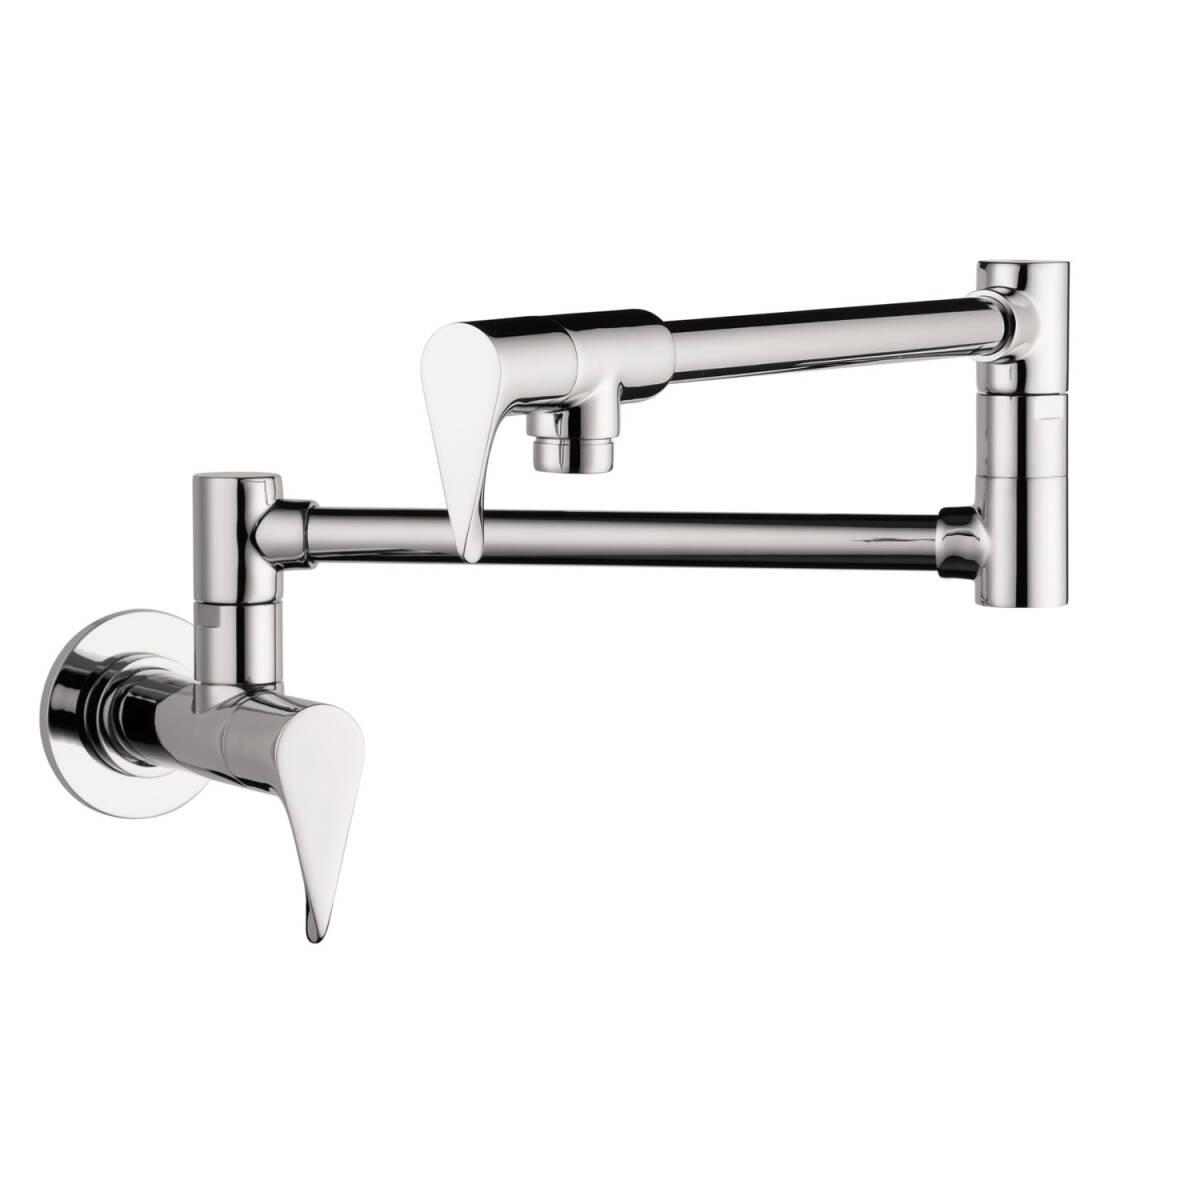 Single lever kitchen mixer wall-mounted, Chrome, 39834001